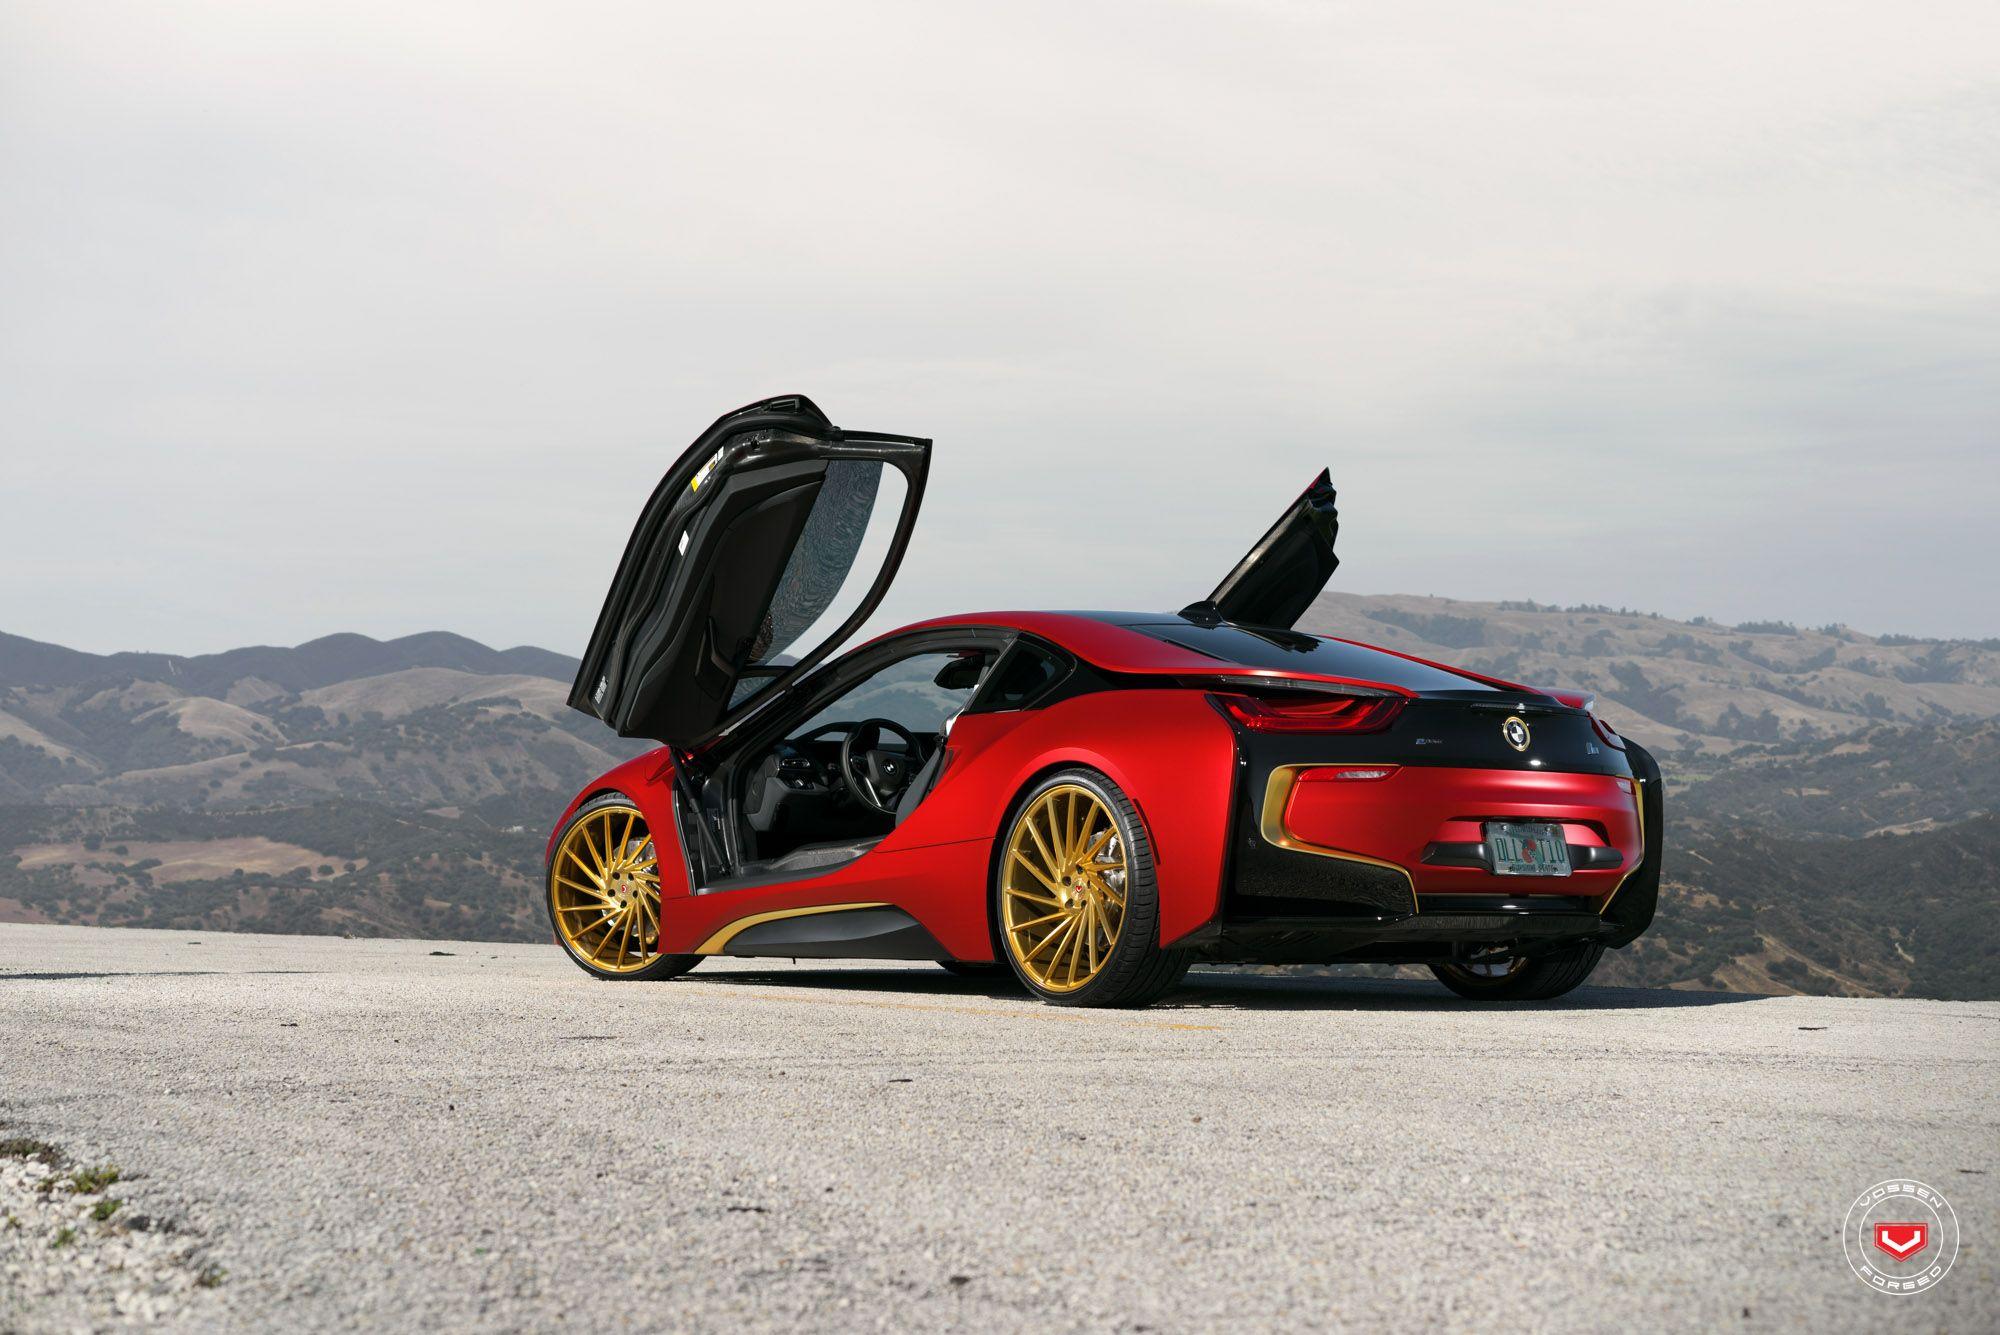 Bmw I8 Coupe Edrive Red Devil Burn Fire Vossen Wheels